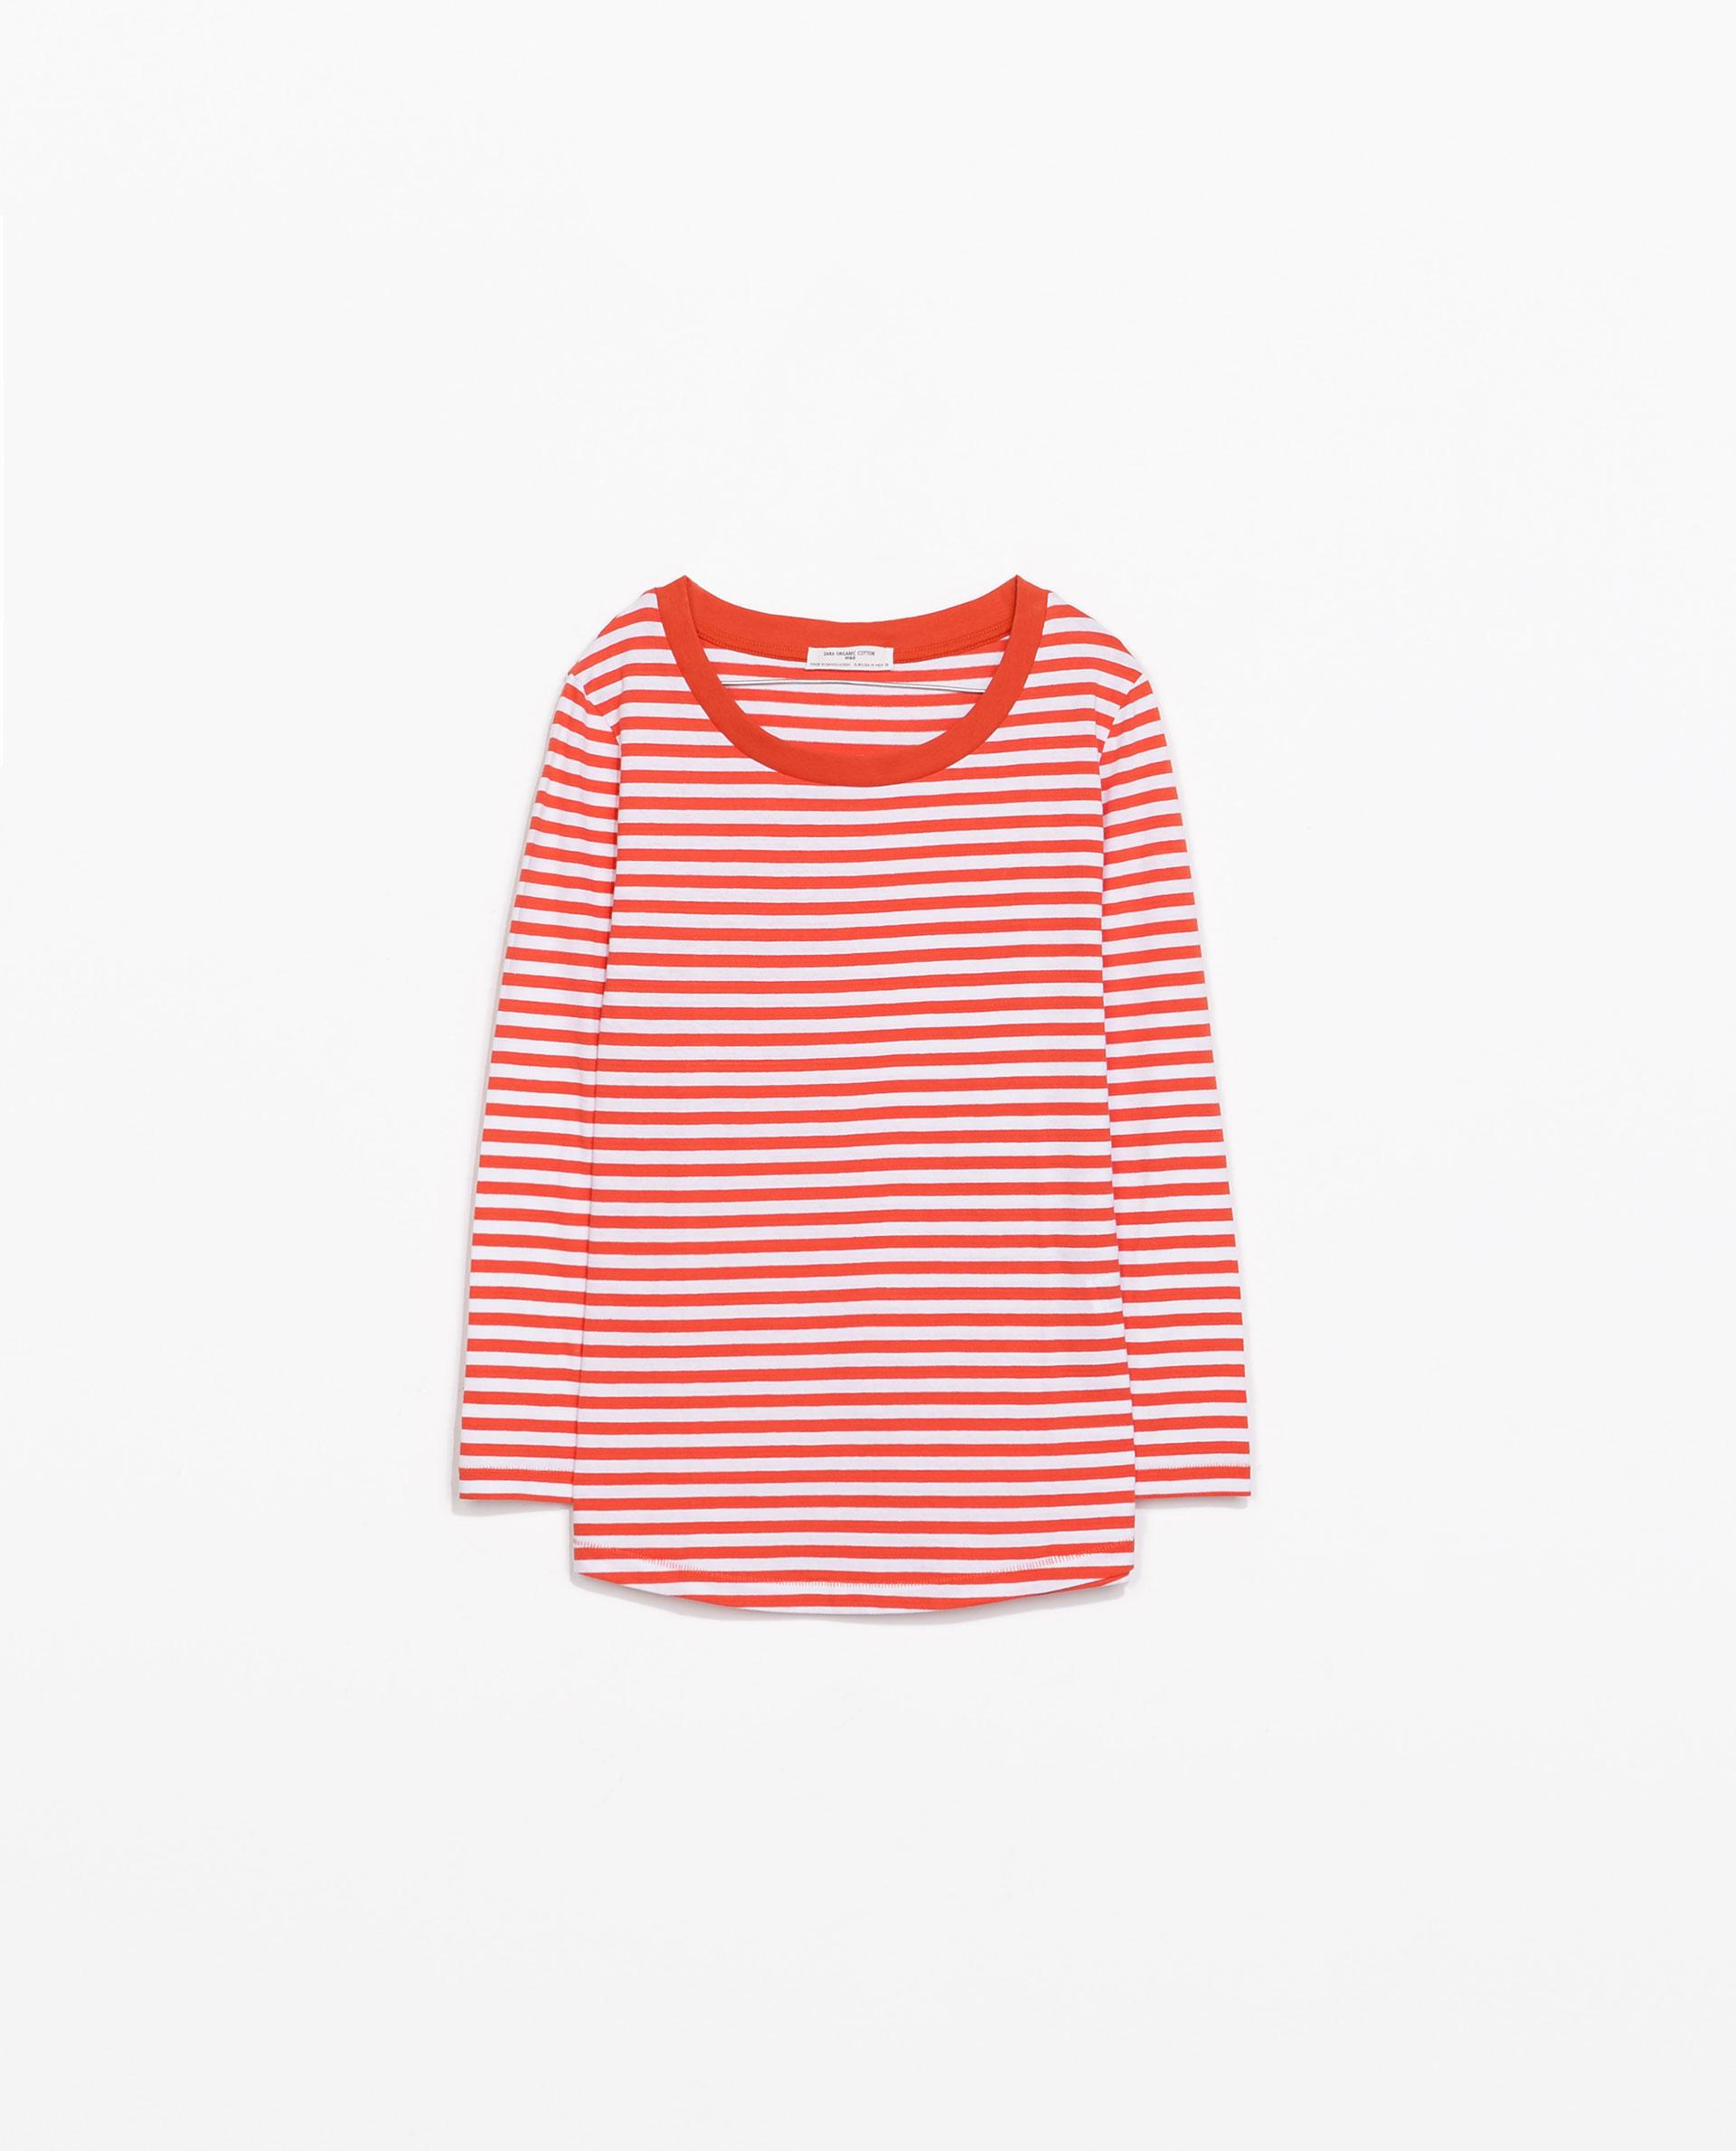 Zara Striped Organic Cotton T Shirt In Red White Red